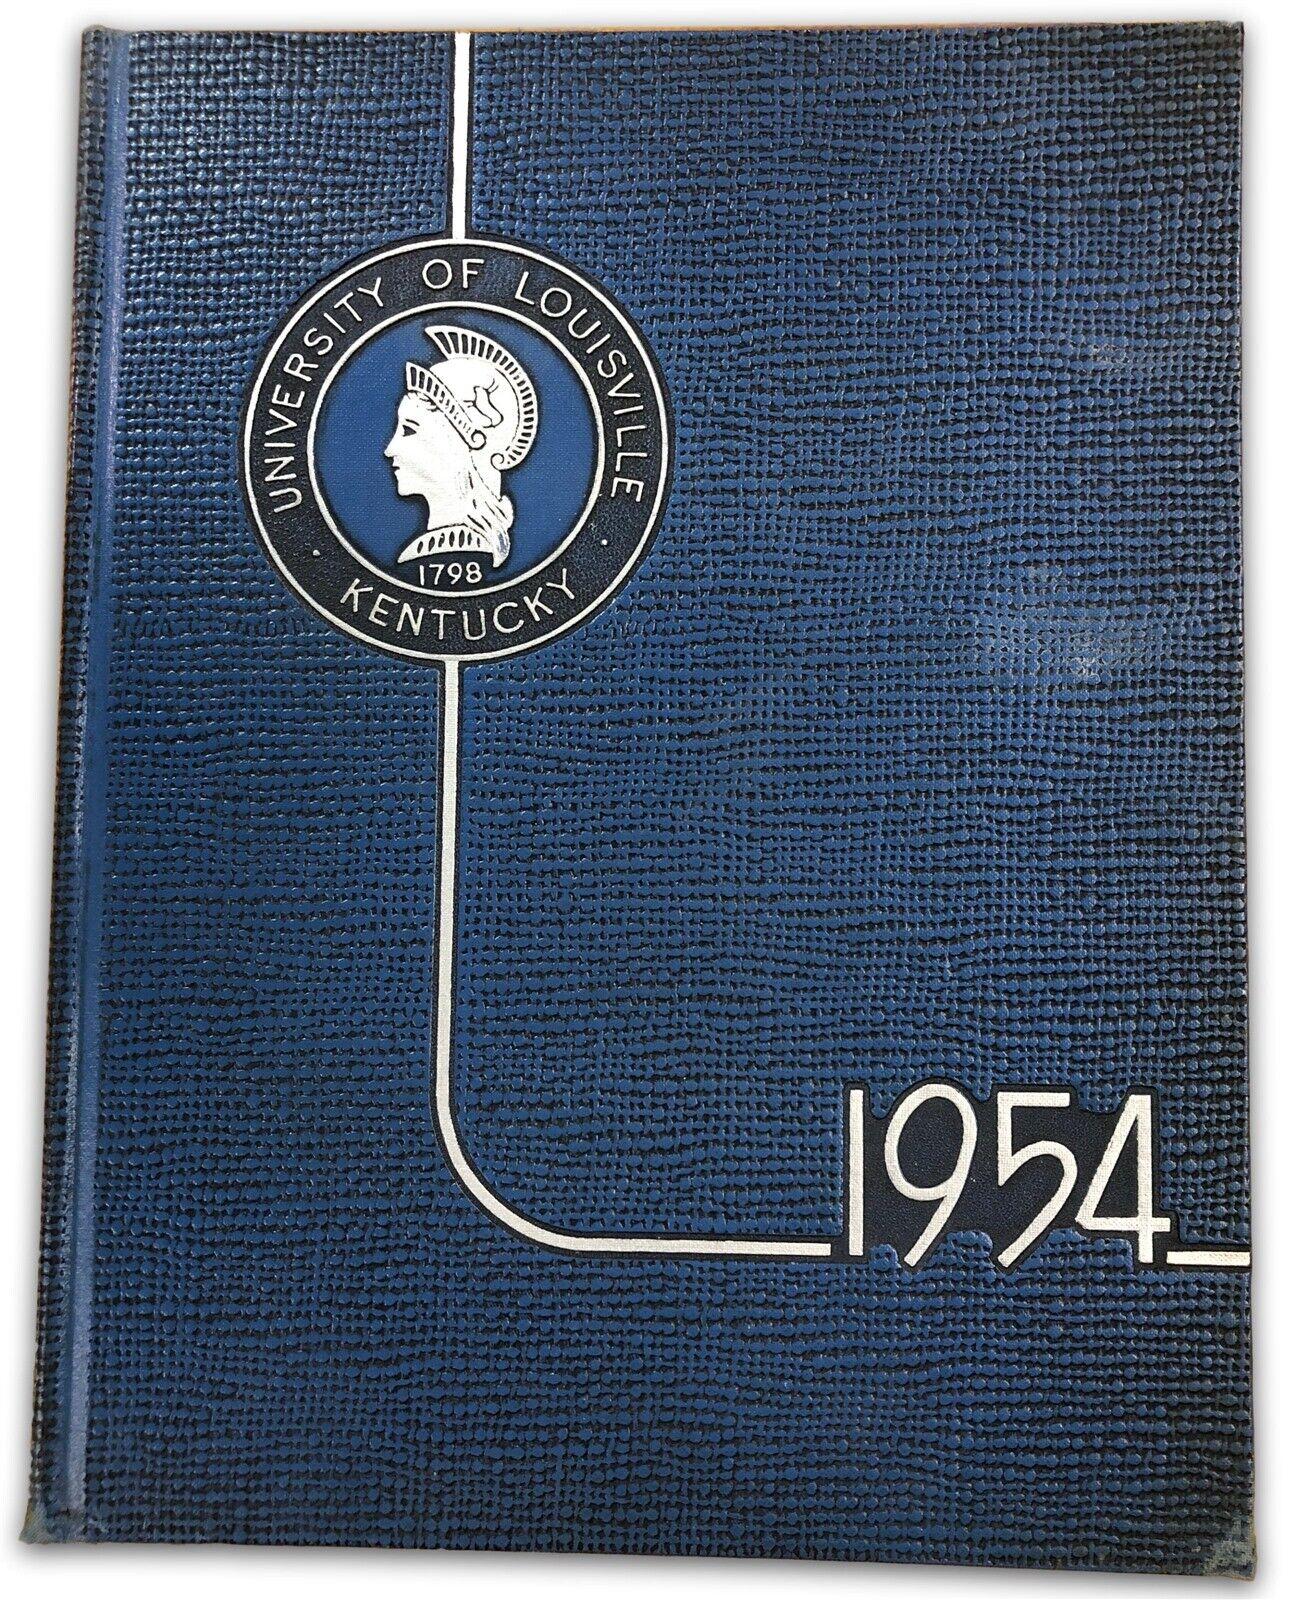 Johnny Unitas Junior Season University Of Louisville 1954 Thoroughbred Yearbook Ebay